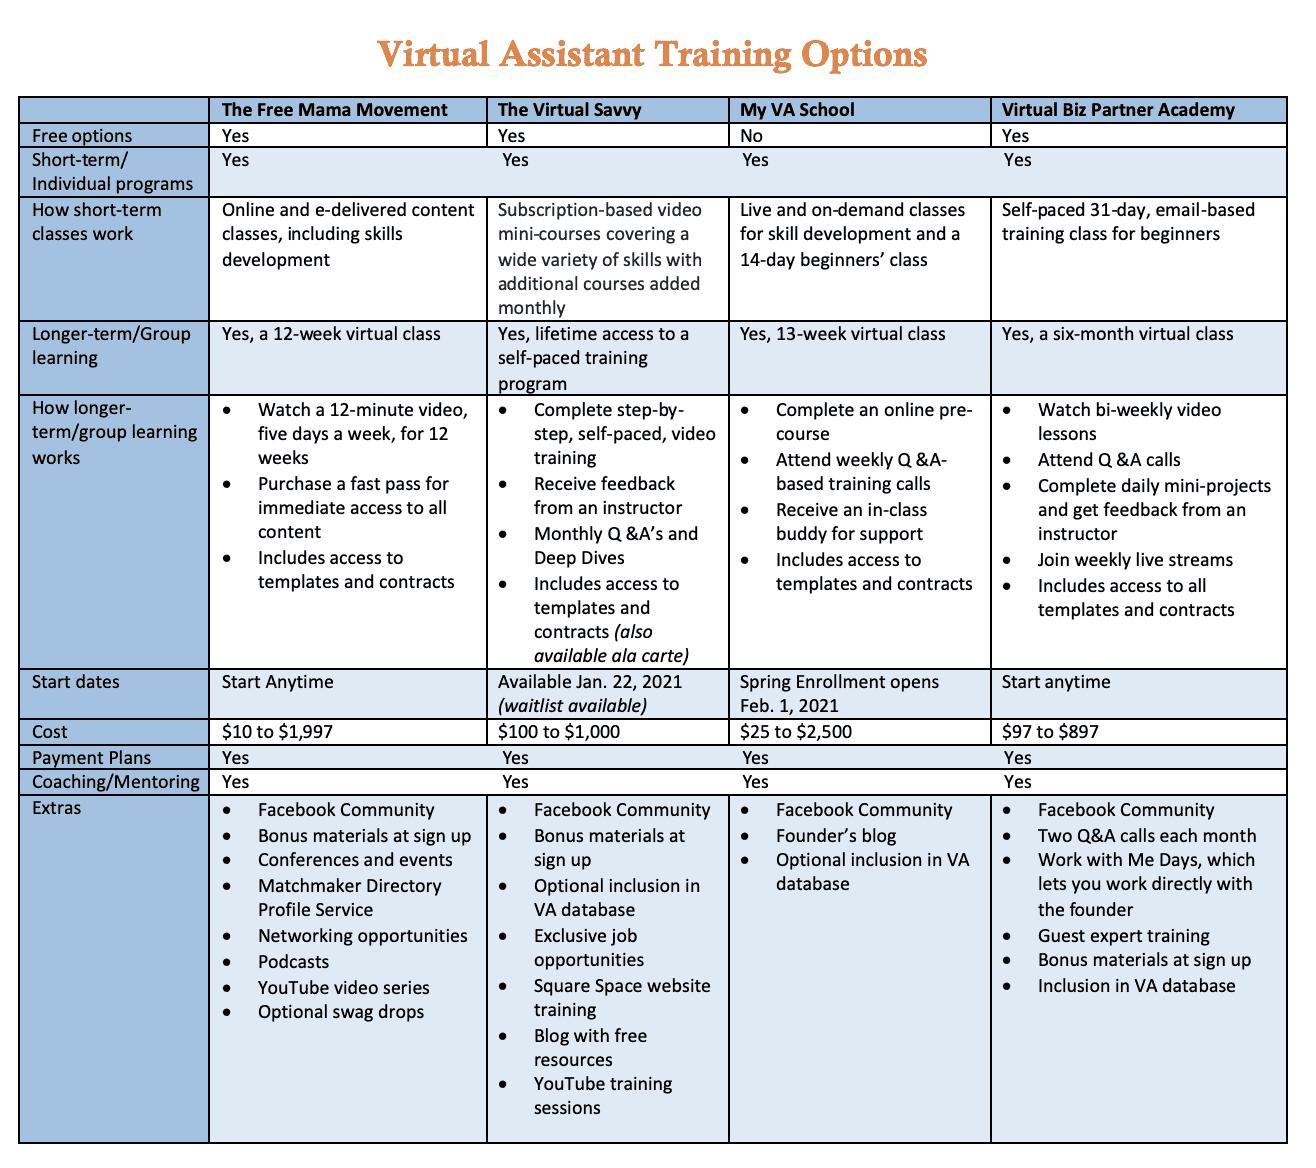 VA Training Options